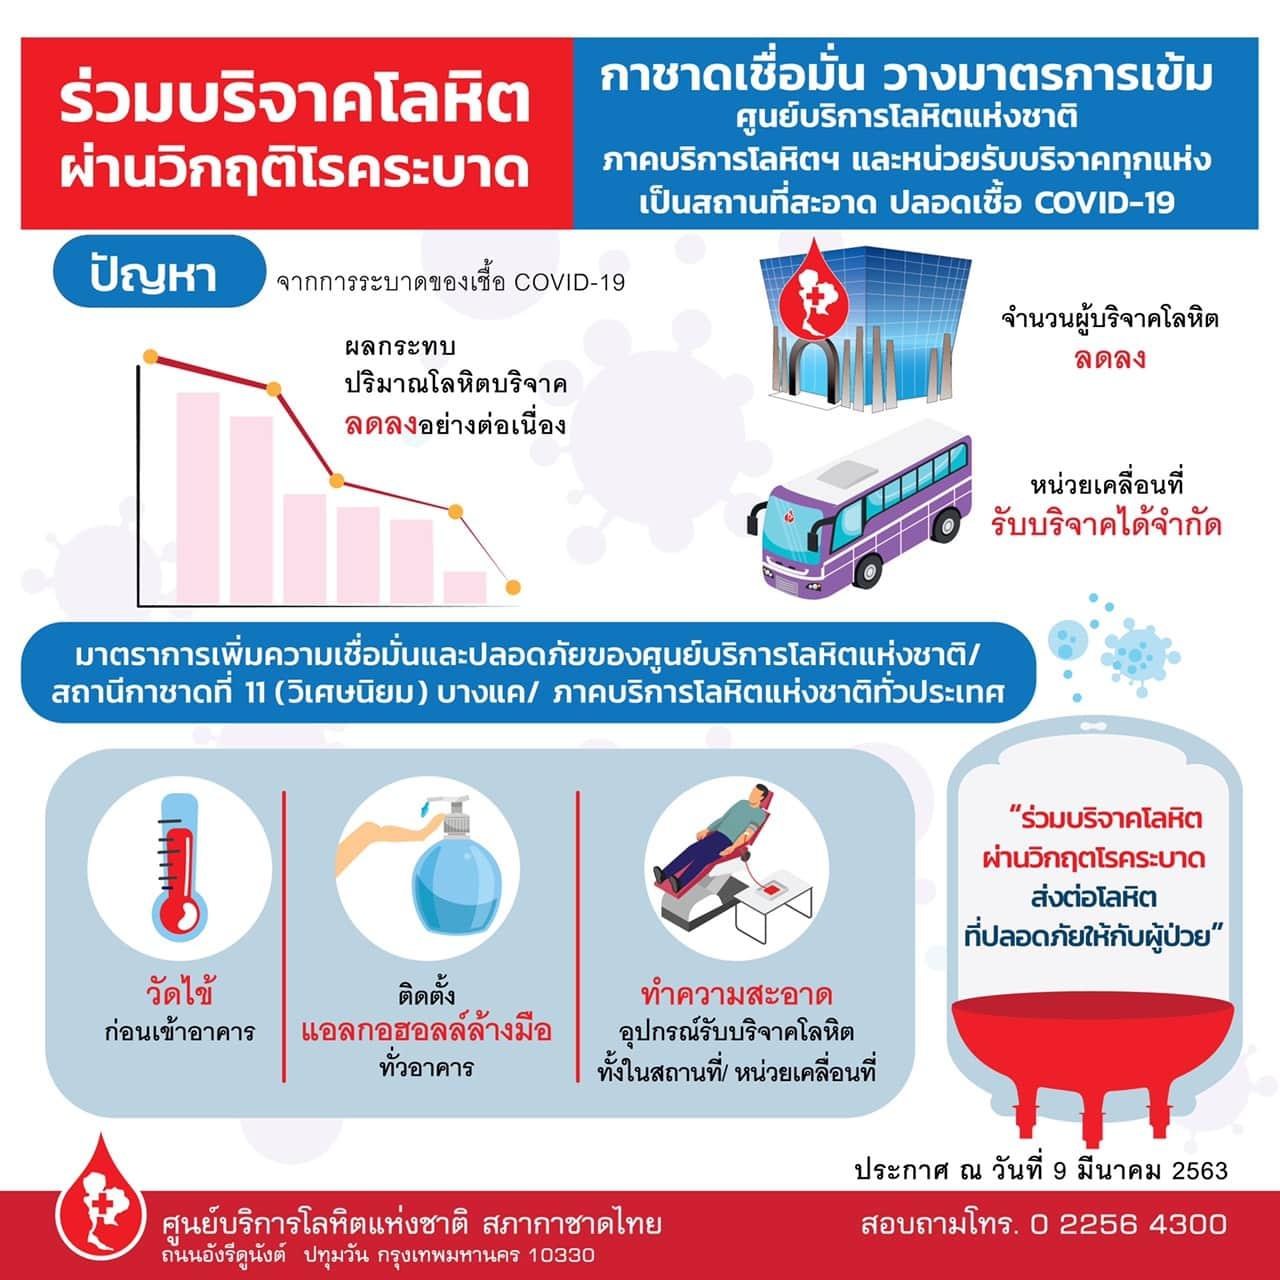 blood 2 - แนะนำสถานที่บริจาคโลหิตในช่วงการระบาดของโรค COVID-19